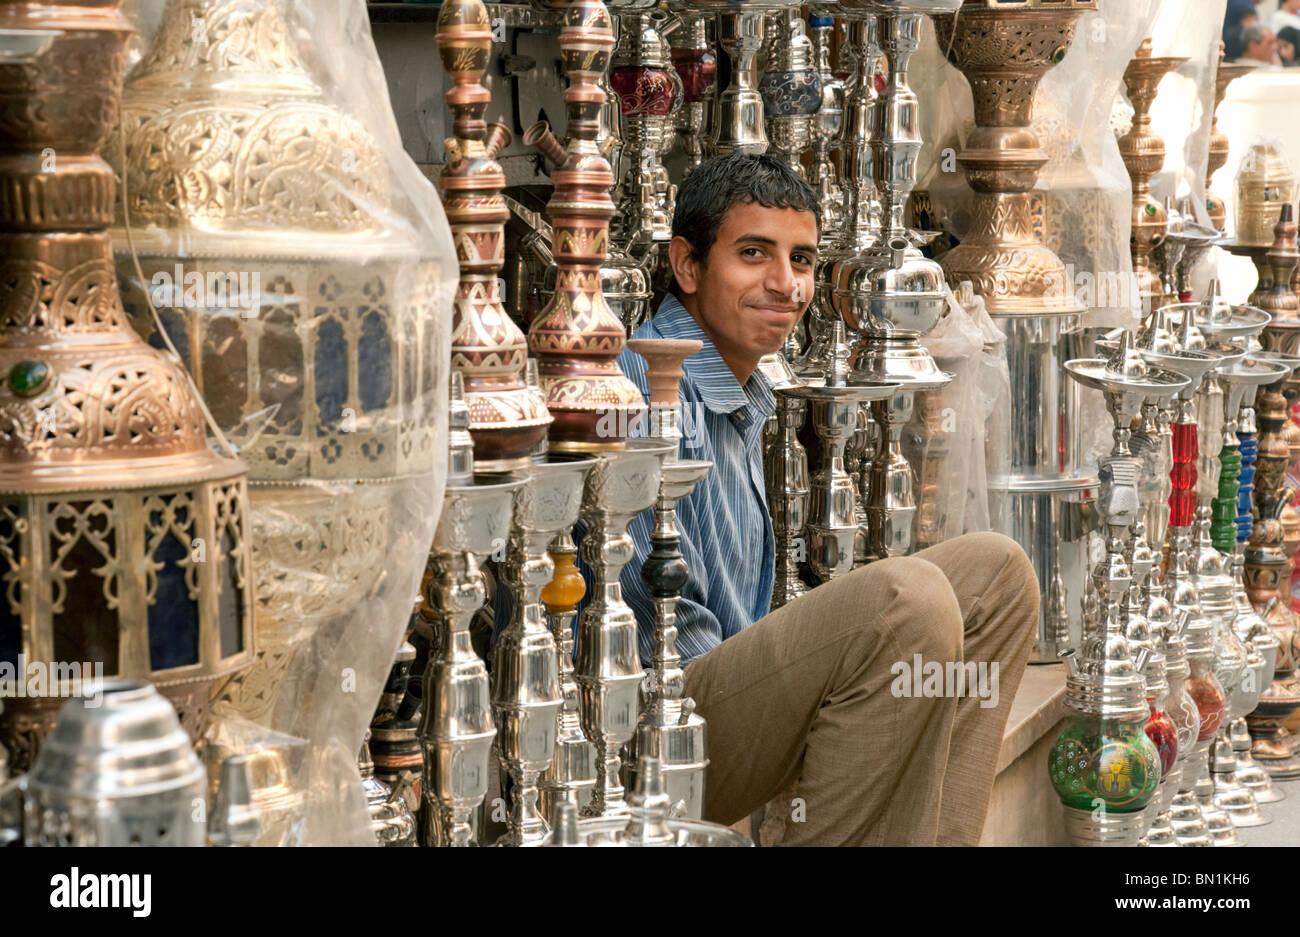 Shop and shopkeeper in the Khan al khalili market, Islamic quarter, Cairo Egypt - Stock Image